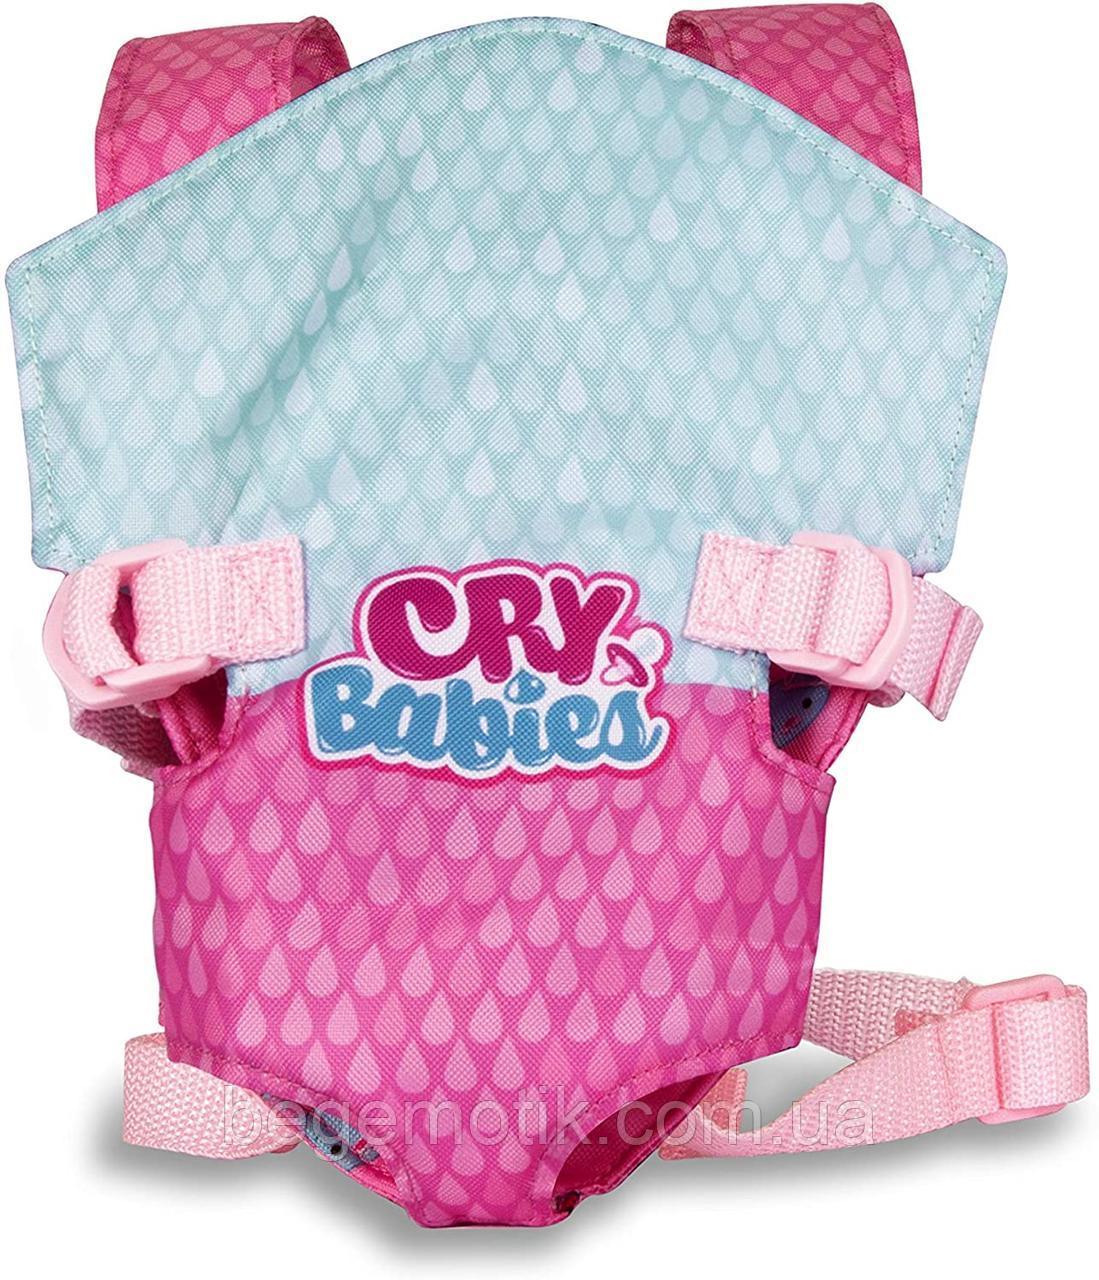 Cry Babies детская переноска для кукол Край Беби IMC Toys 90019IM BEBÉS LLORONES Portabebes Carrier